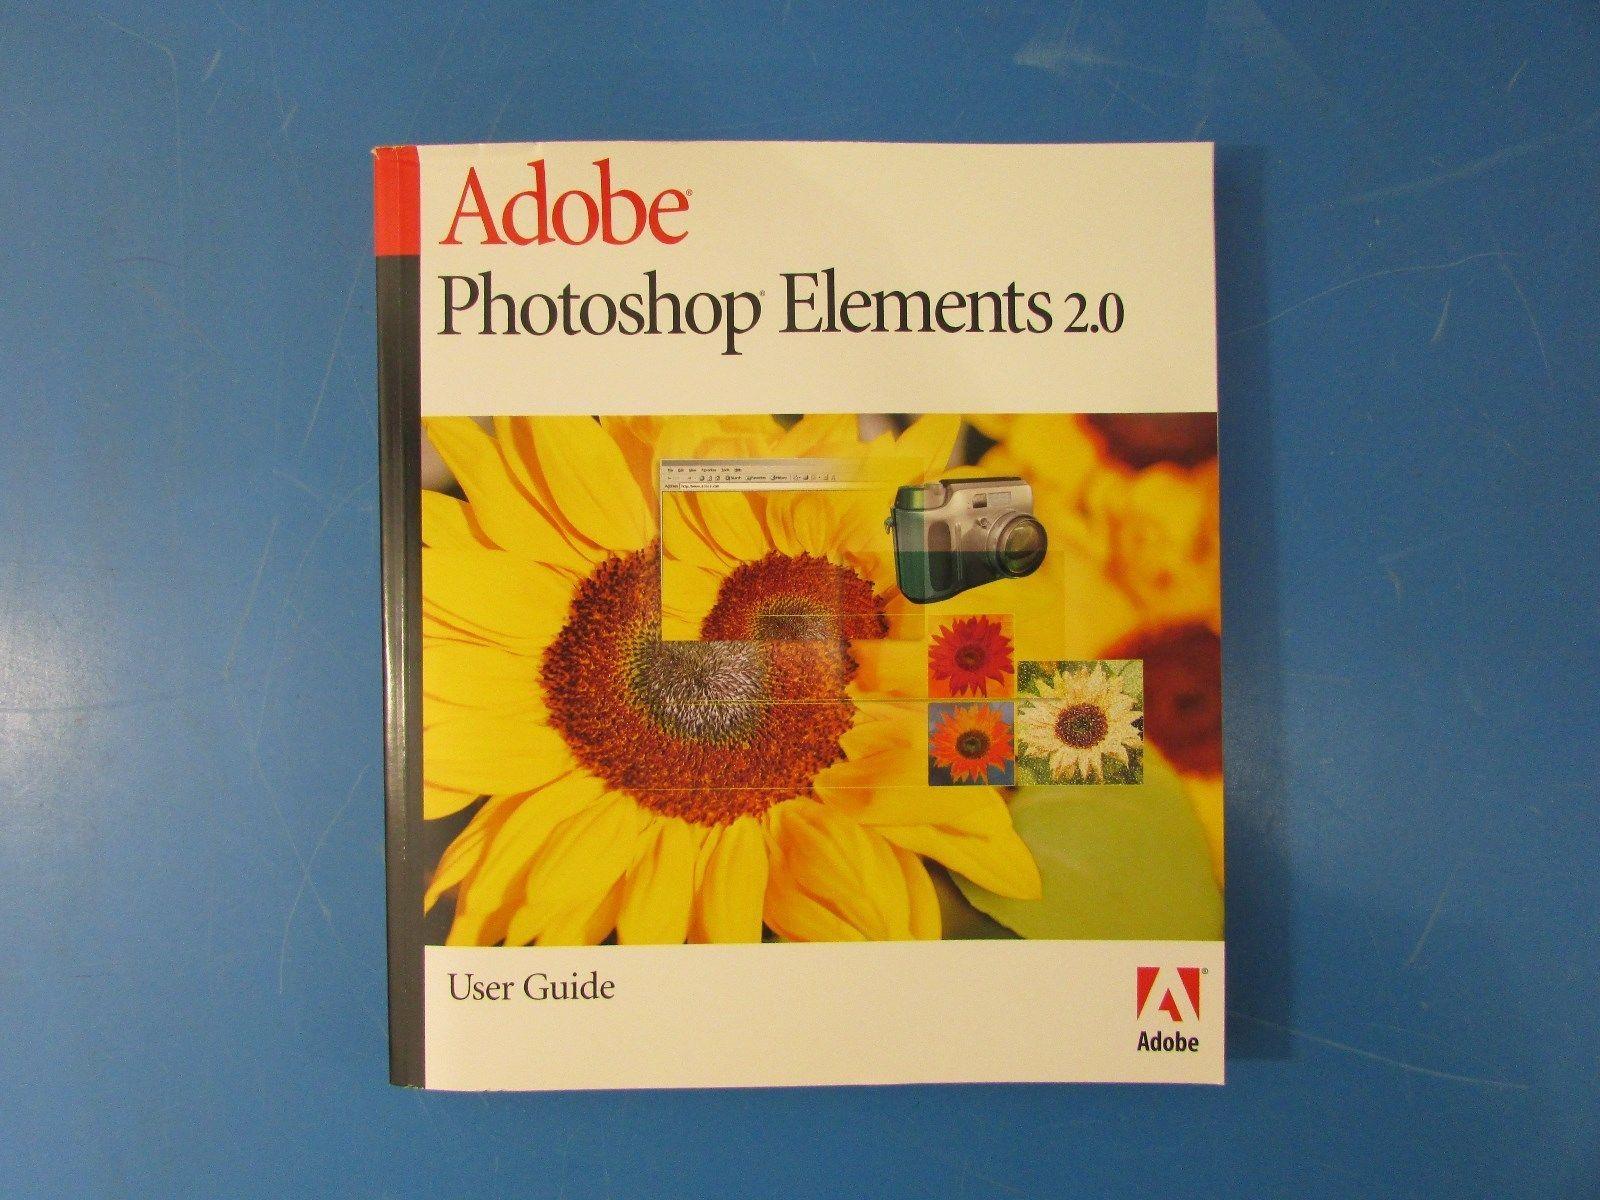 adobe 49230201 photoshop elements 2 0 user and 50 similar items rh bonanza com Adobe InDesign Adobe Photoshop Elements 12